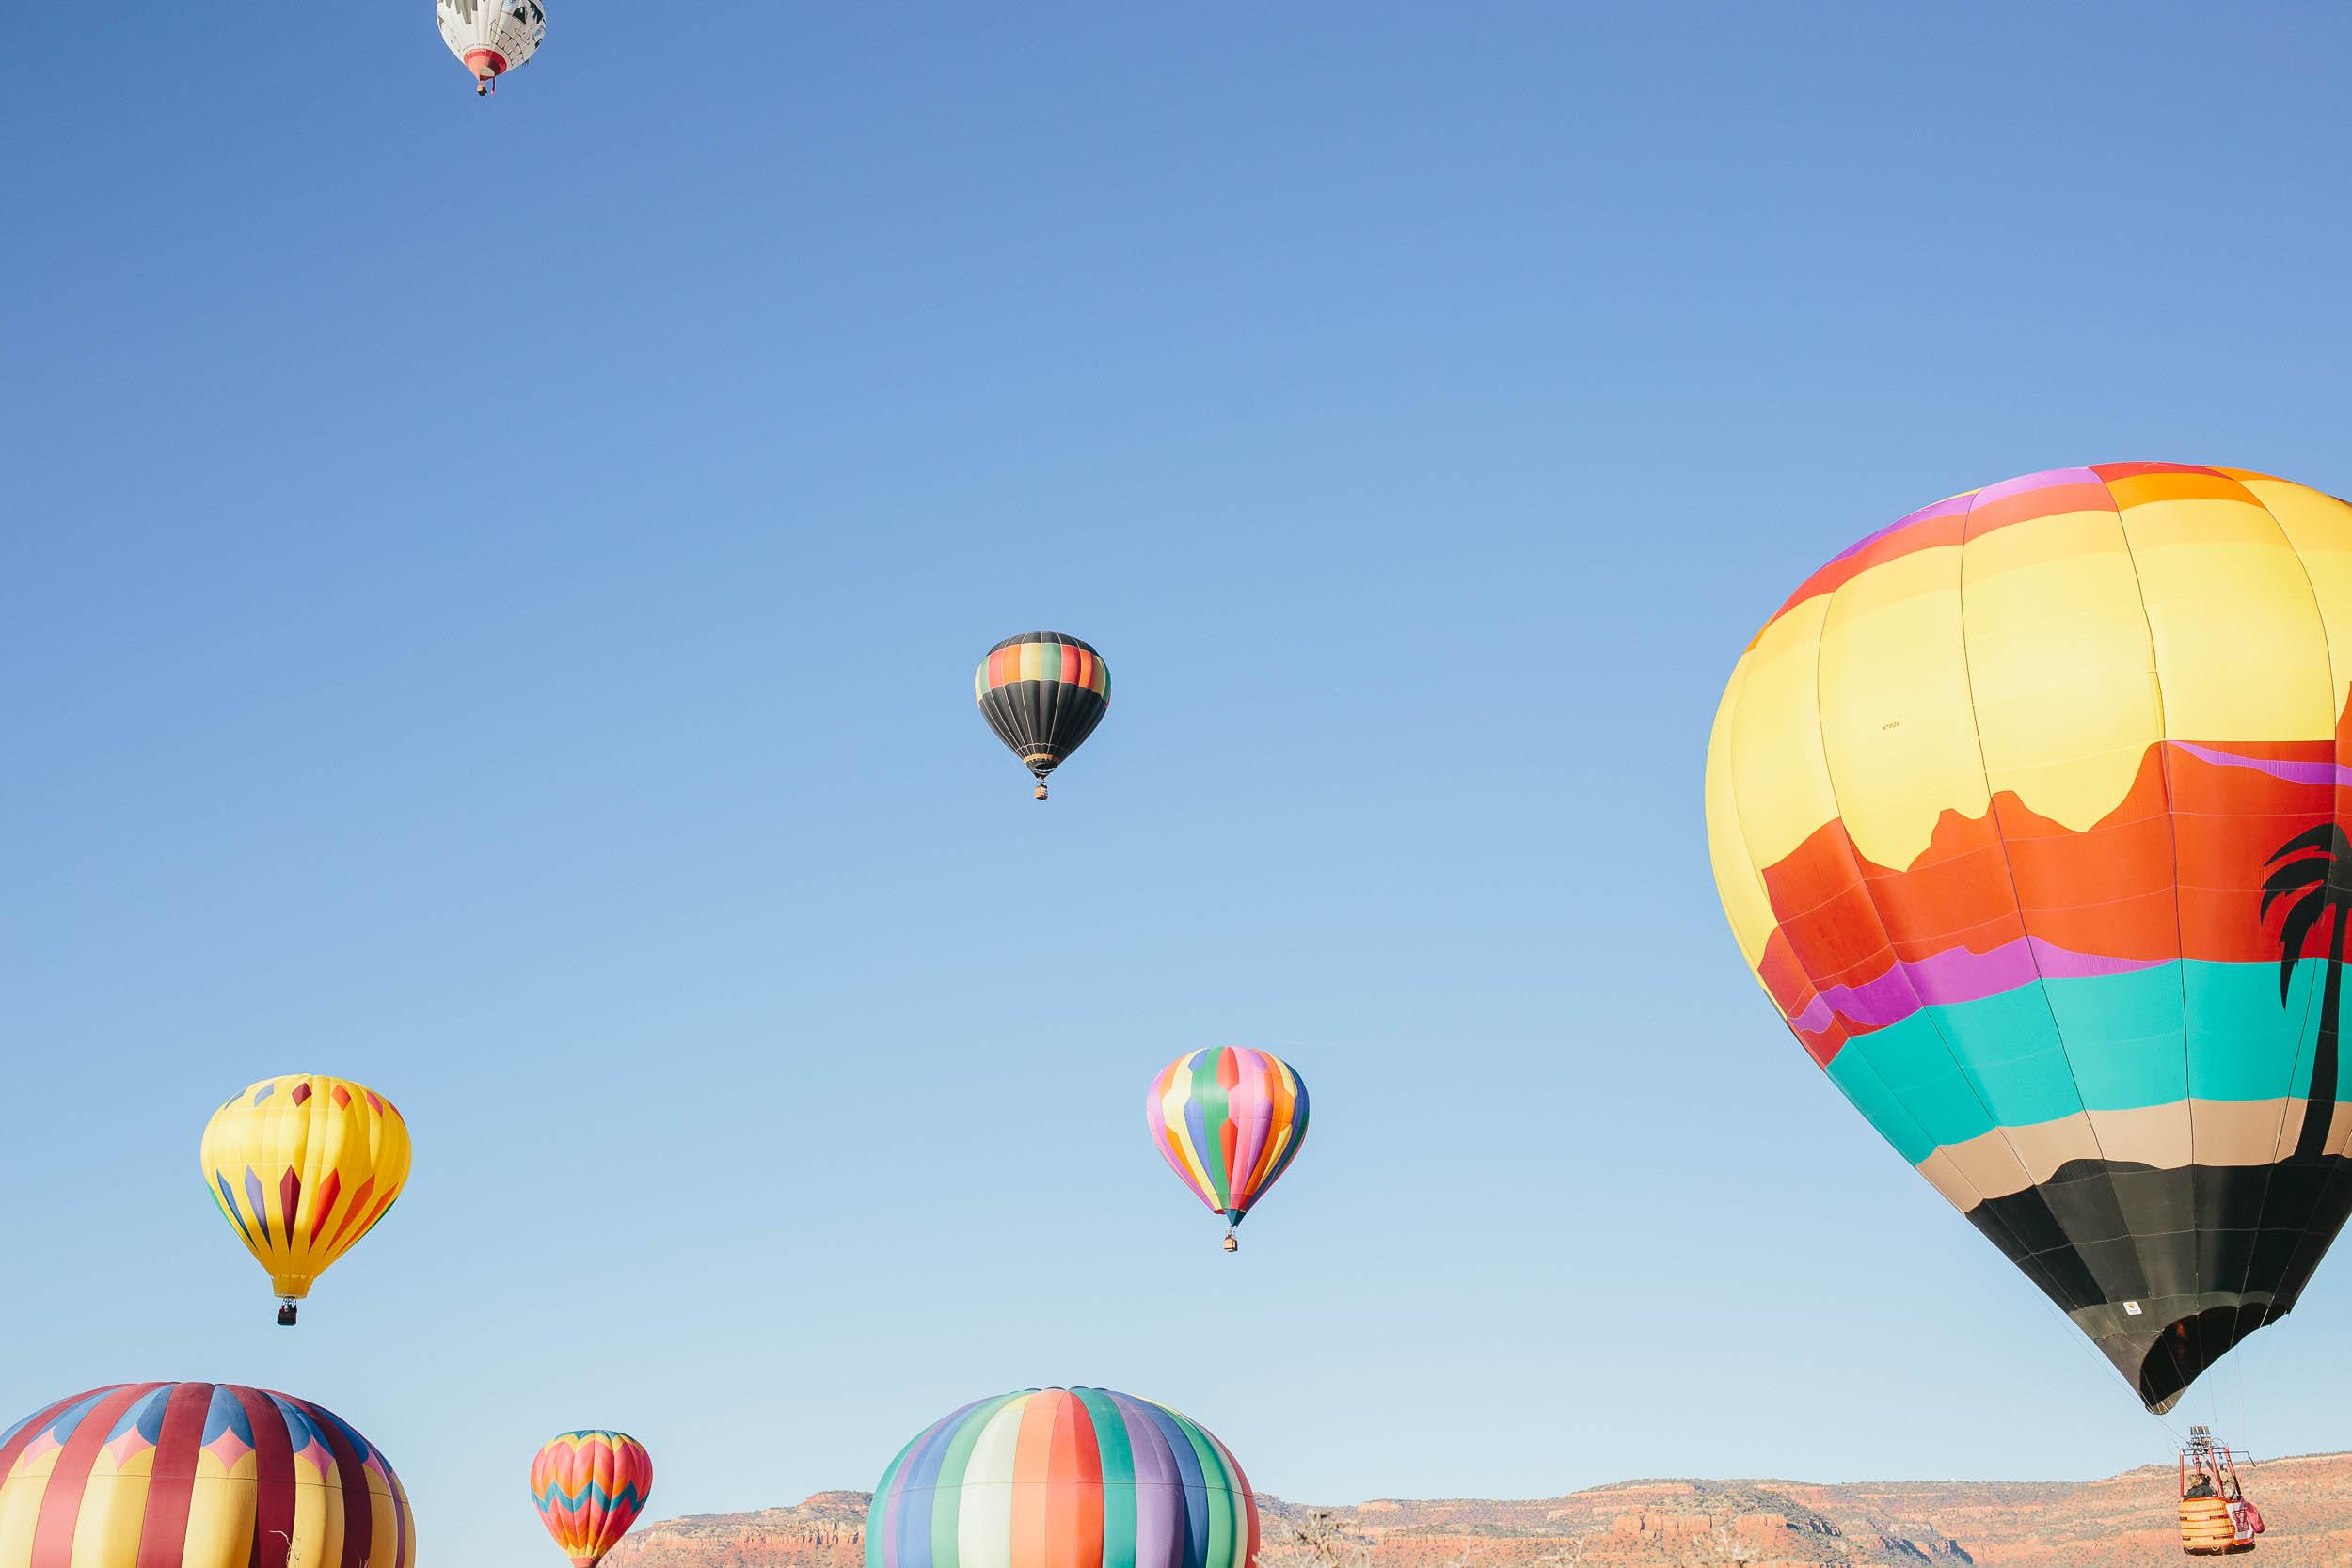 Kyle-Sheppard-Kanab-Balloon-Festival-25.jpg